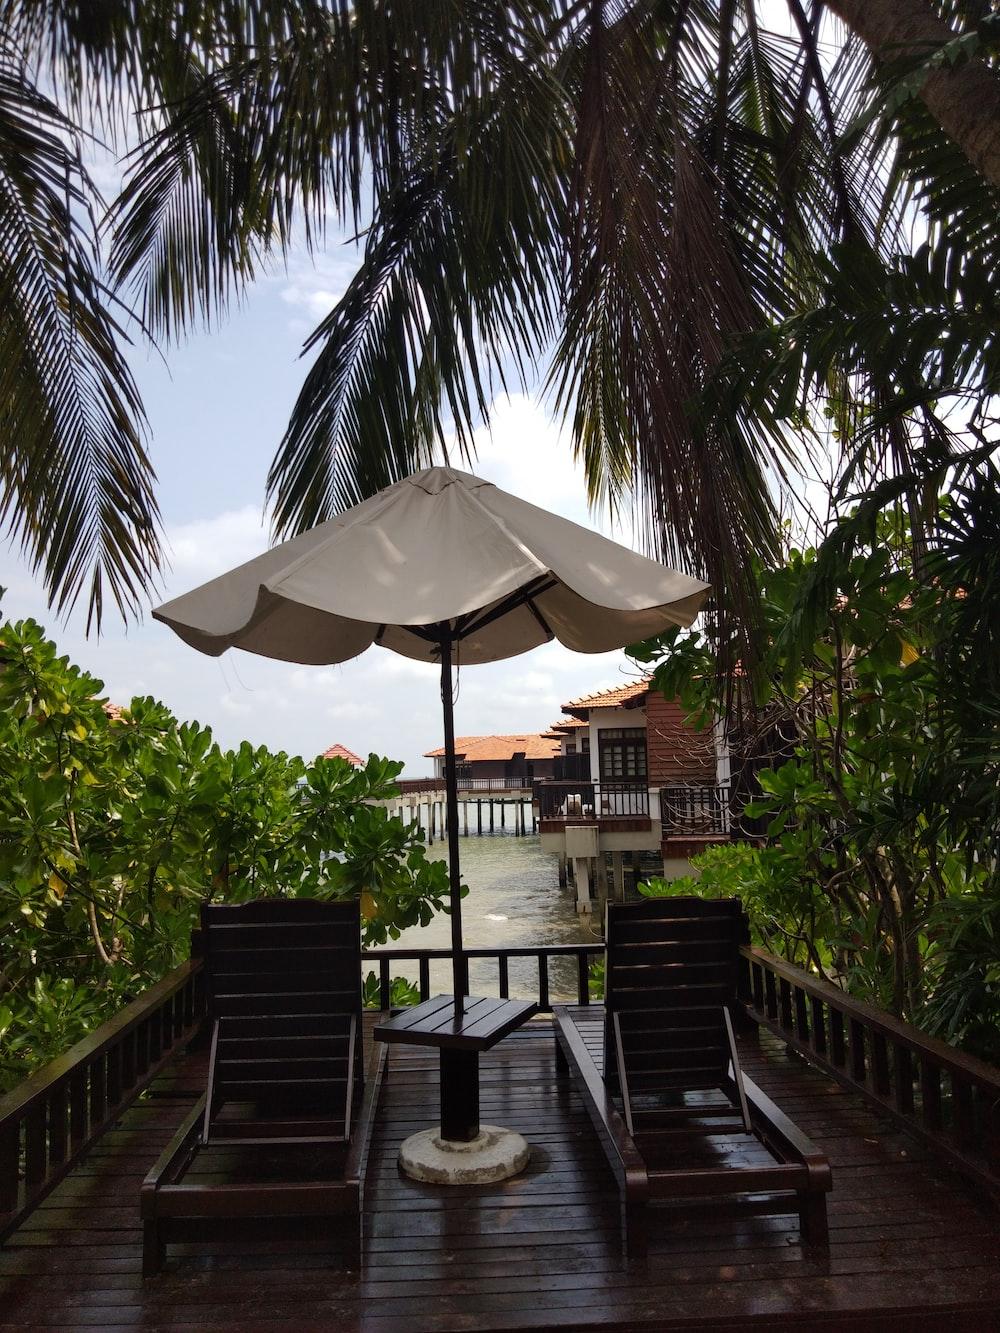 white patio umbrella near green palm trees during daytime